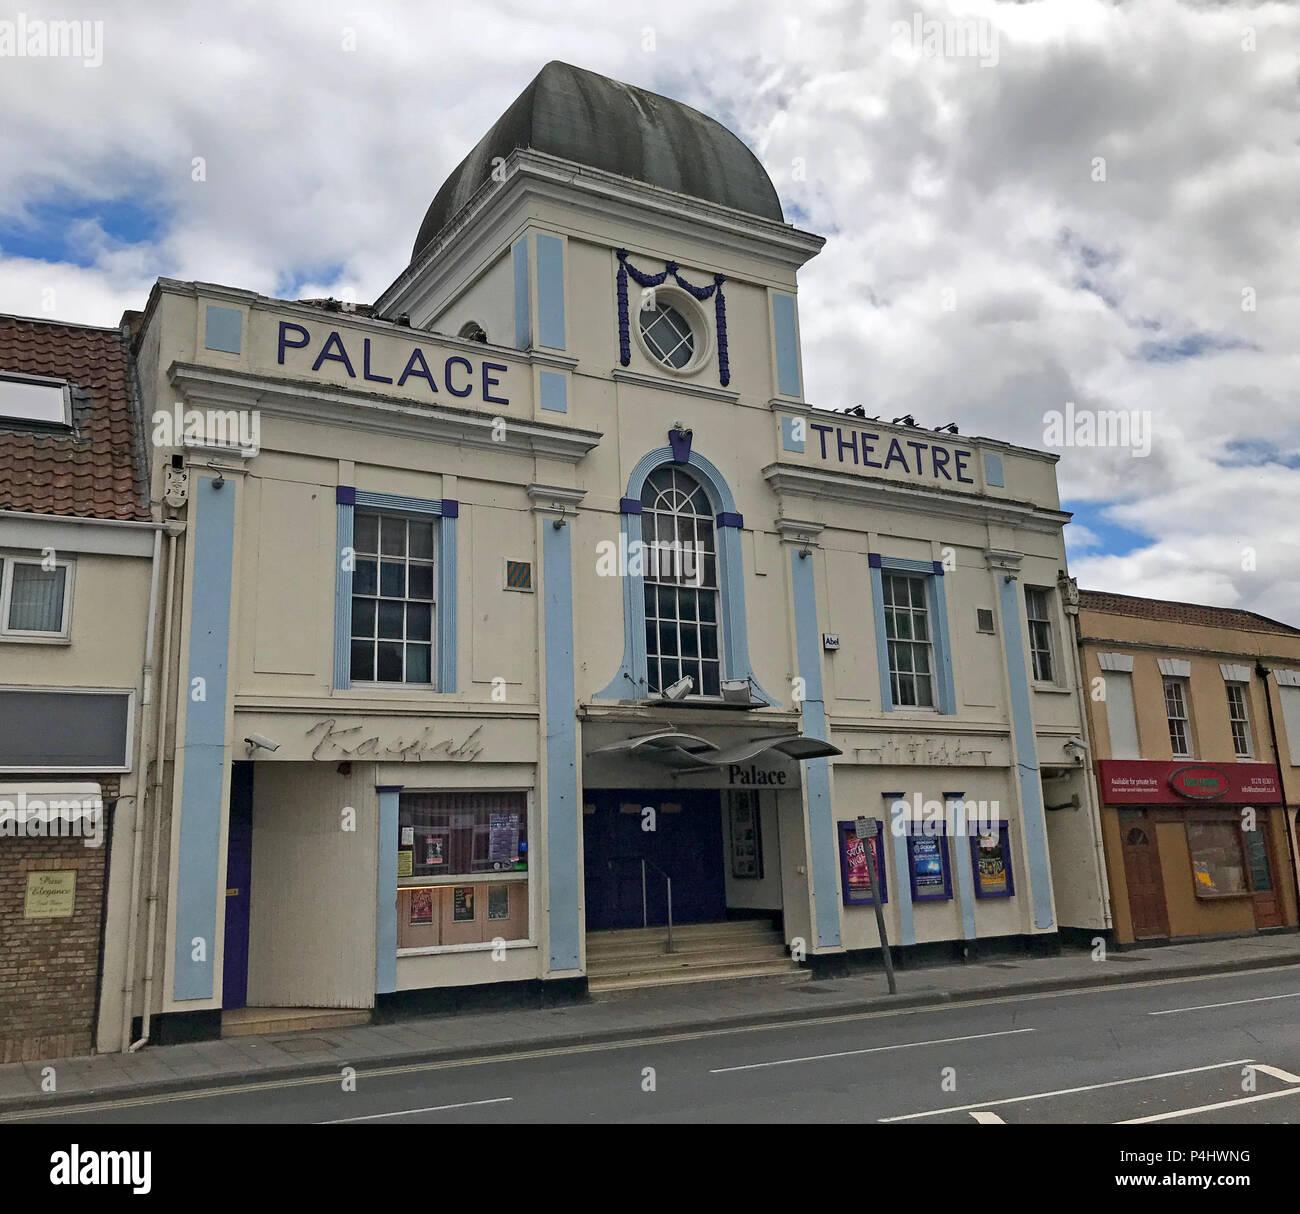 GoTonySmith,@HotpixUK,HotpixUK,Somerset,SDC,town,England,UK,24-26 Penel Orlieu,Bridgwater,building,Nightclub,Bridgwater Town,Moorish,façade,facade,central tower,cinemas,Somerset cinemas,cinema building,Gaumont-British,Gaumont,Barrack Theatre,1916,Bridgwater Nightclub